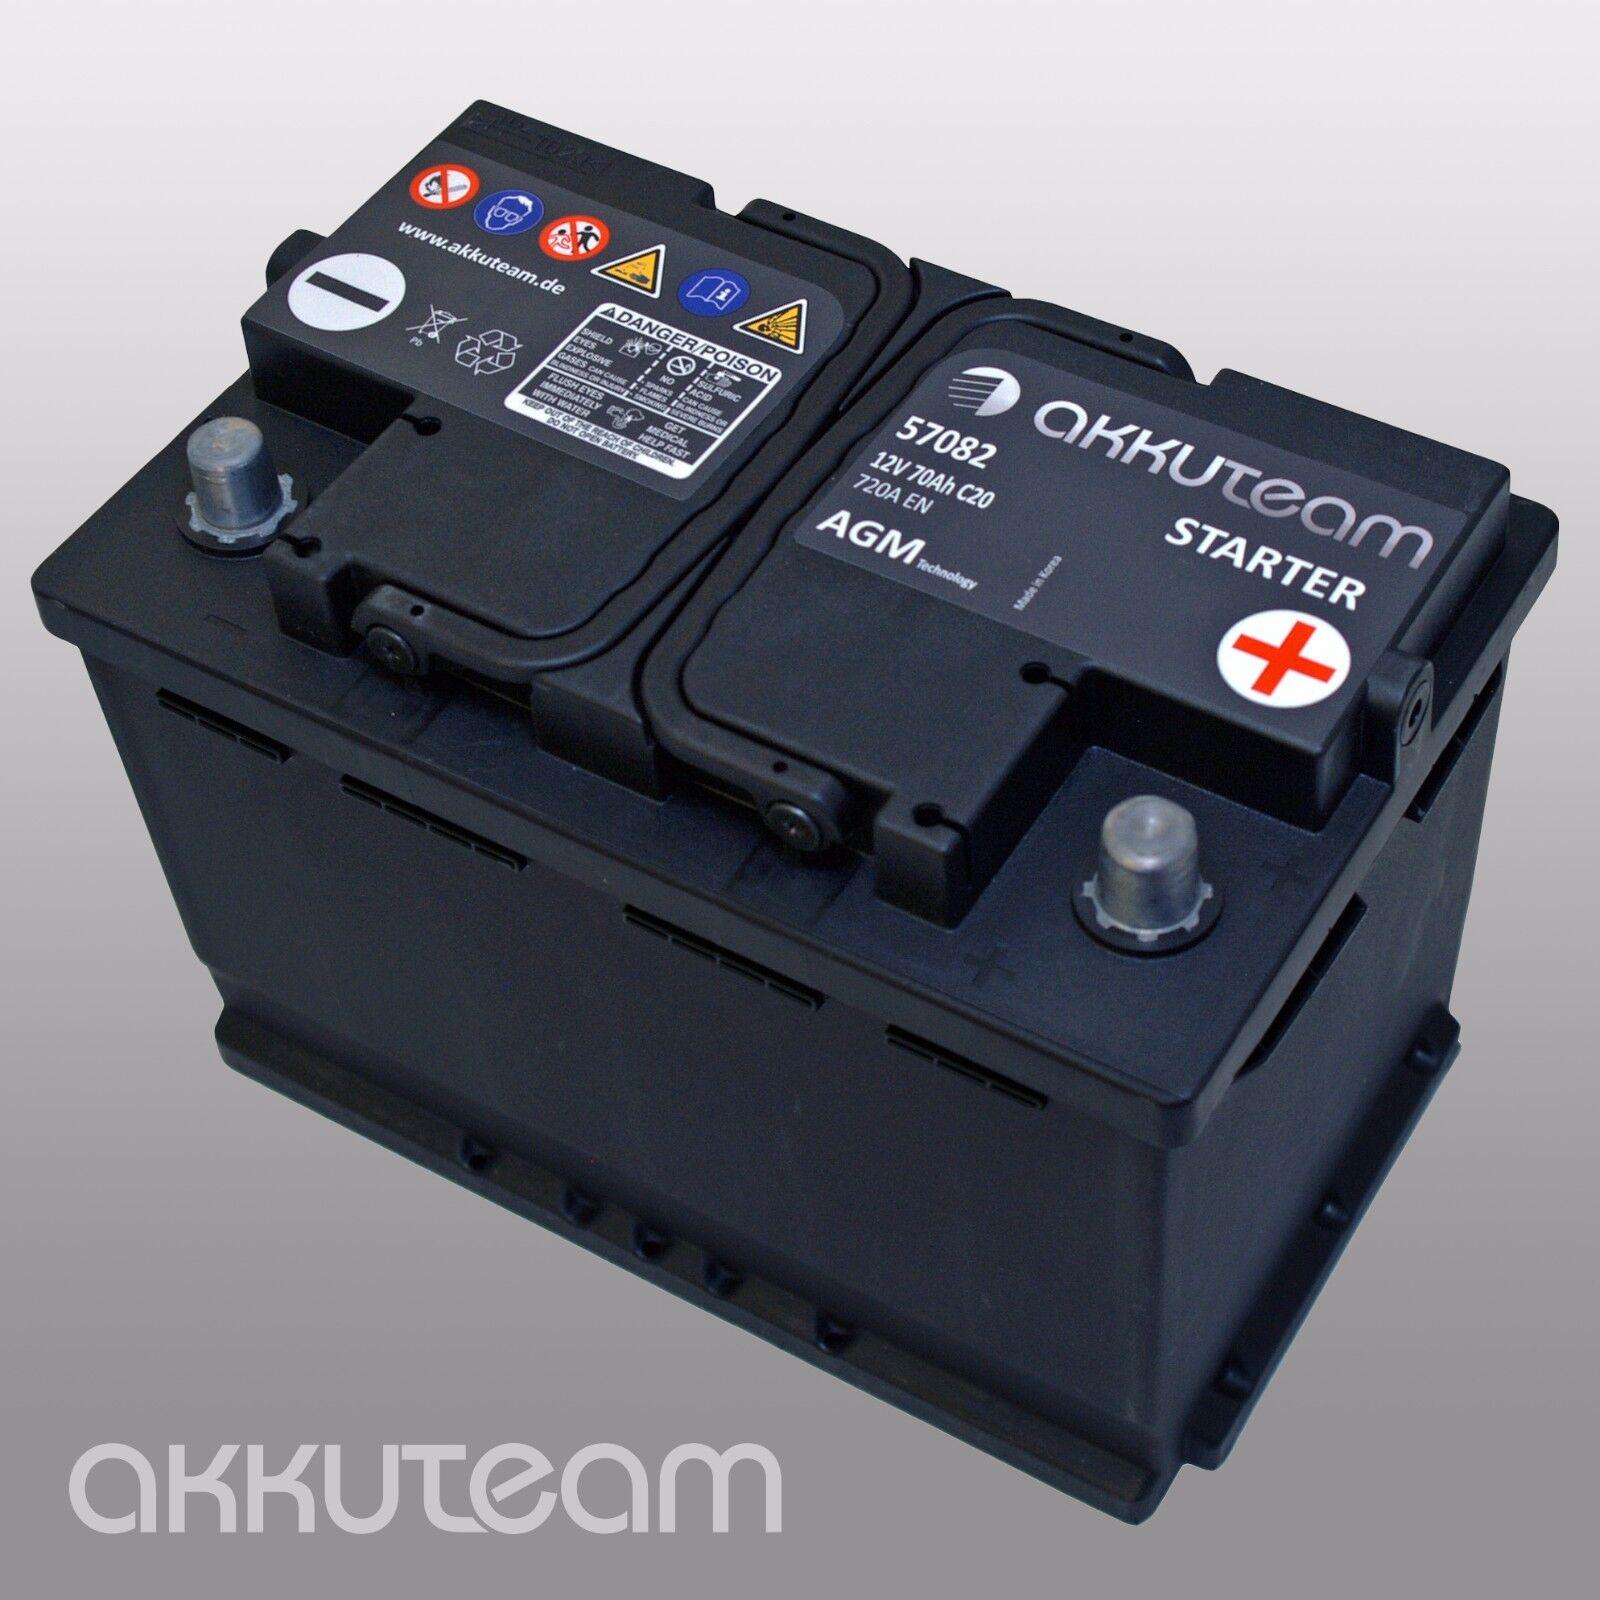 Akku Batterien Auto Test Vergleich Akku Batterien Auto Kaufen